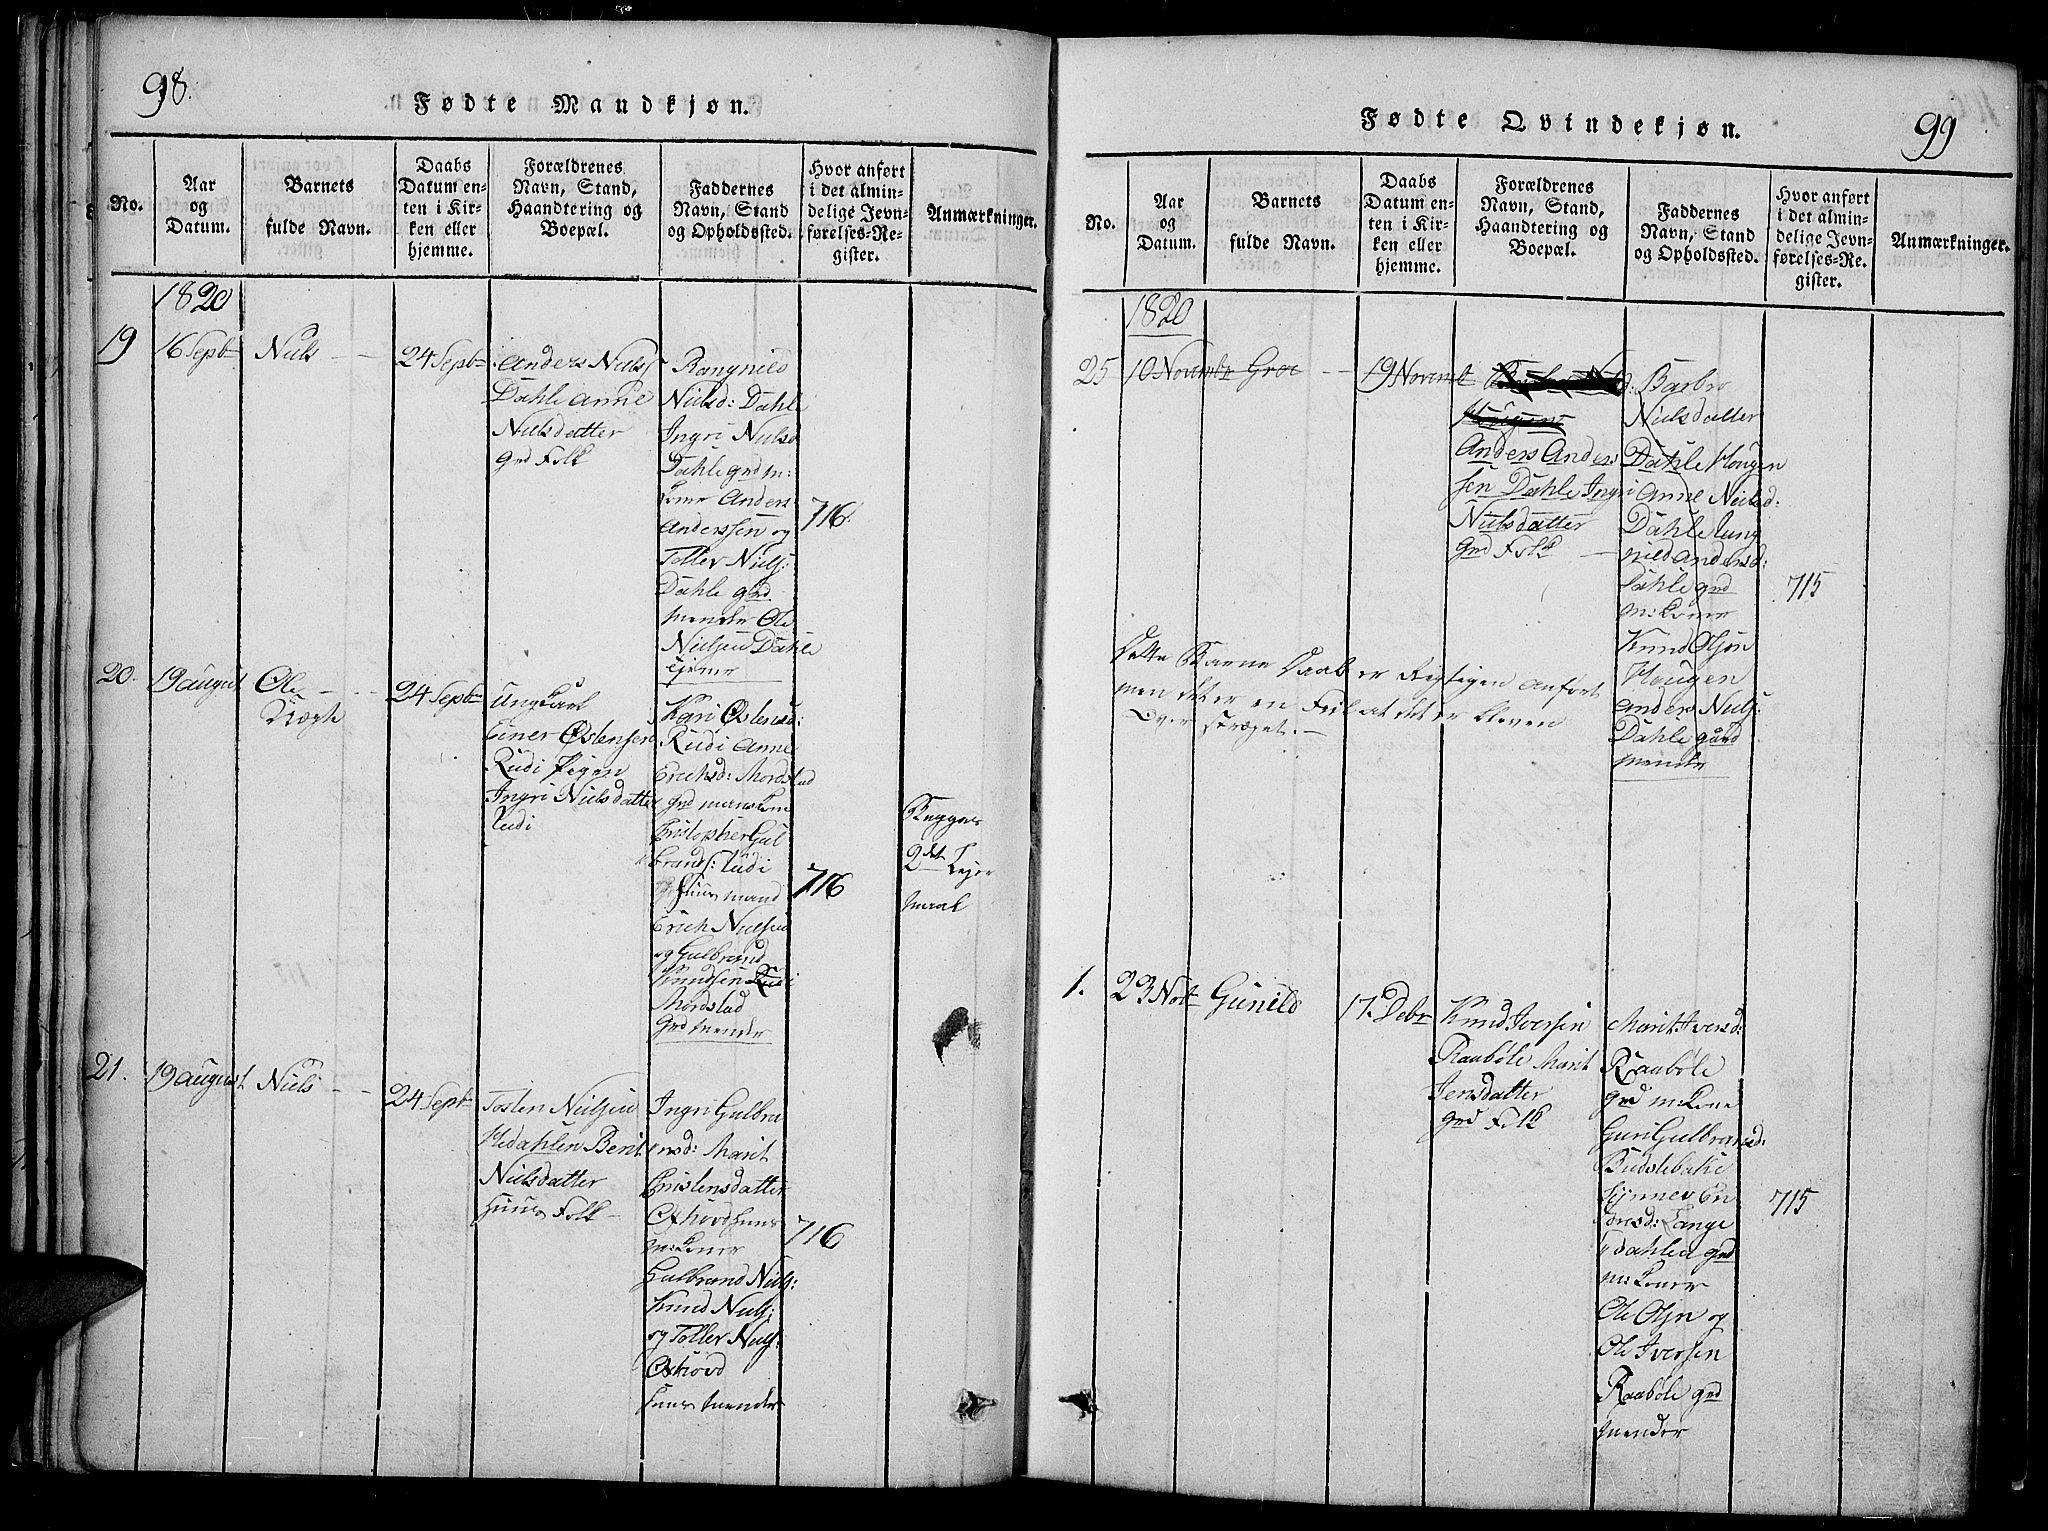 SAH, Slidre prestekontor, Klokkerbok nr. 2, 1814-1839, s. 98-99